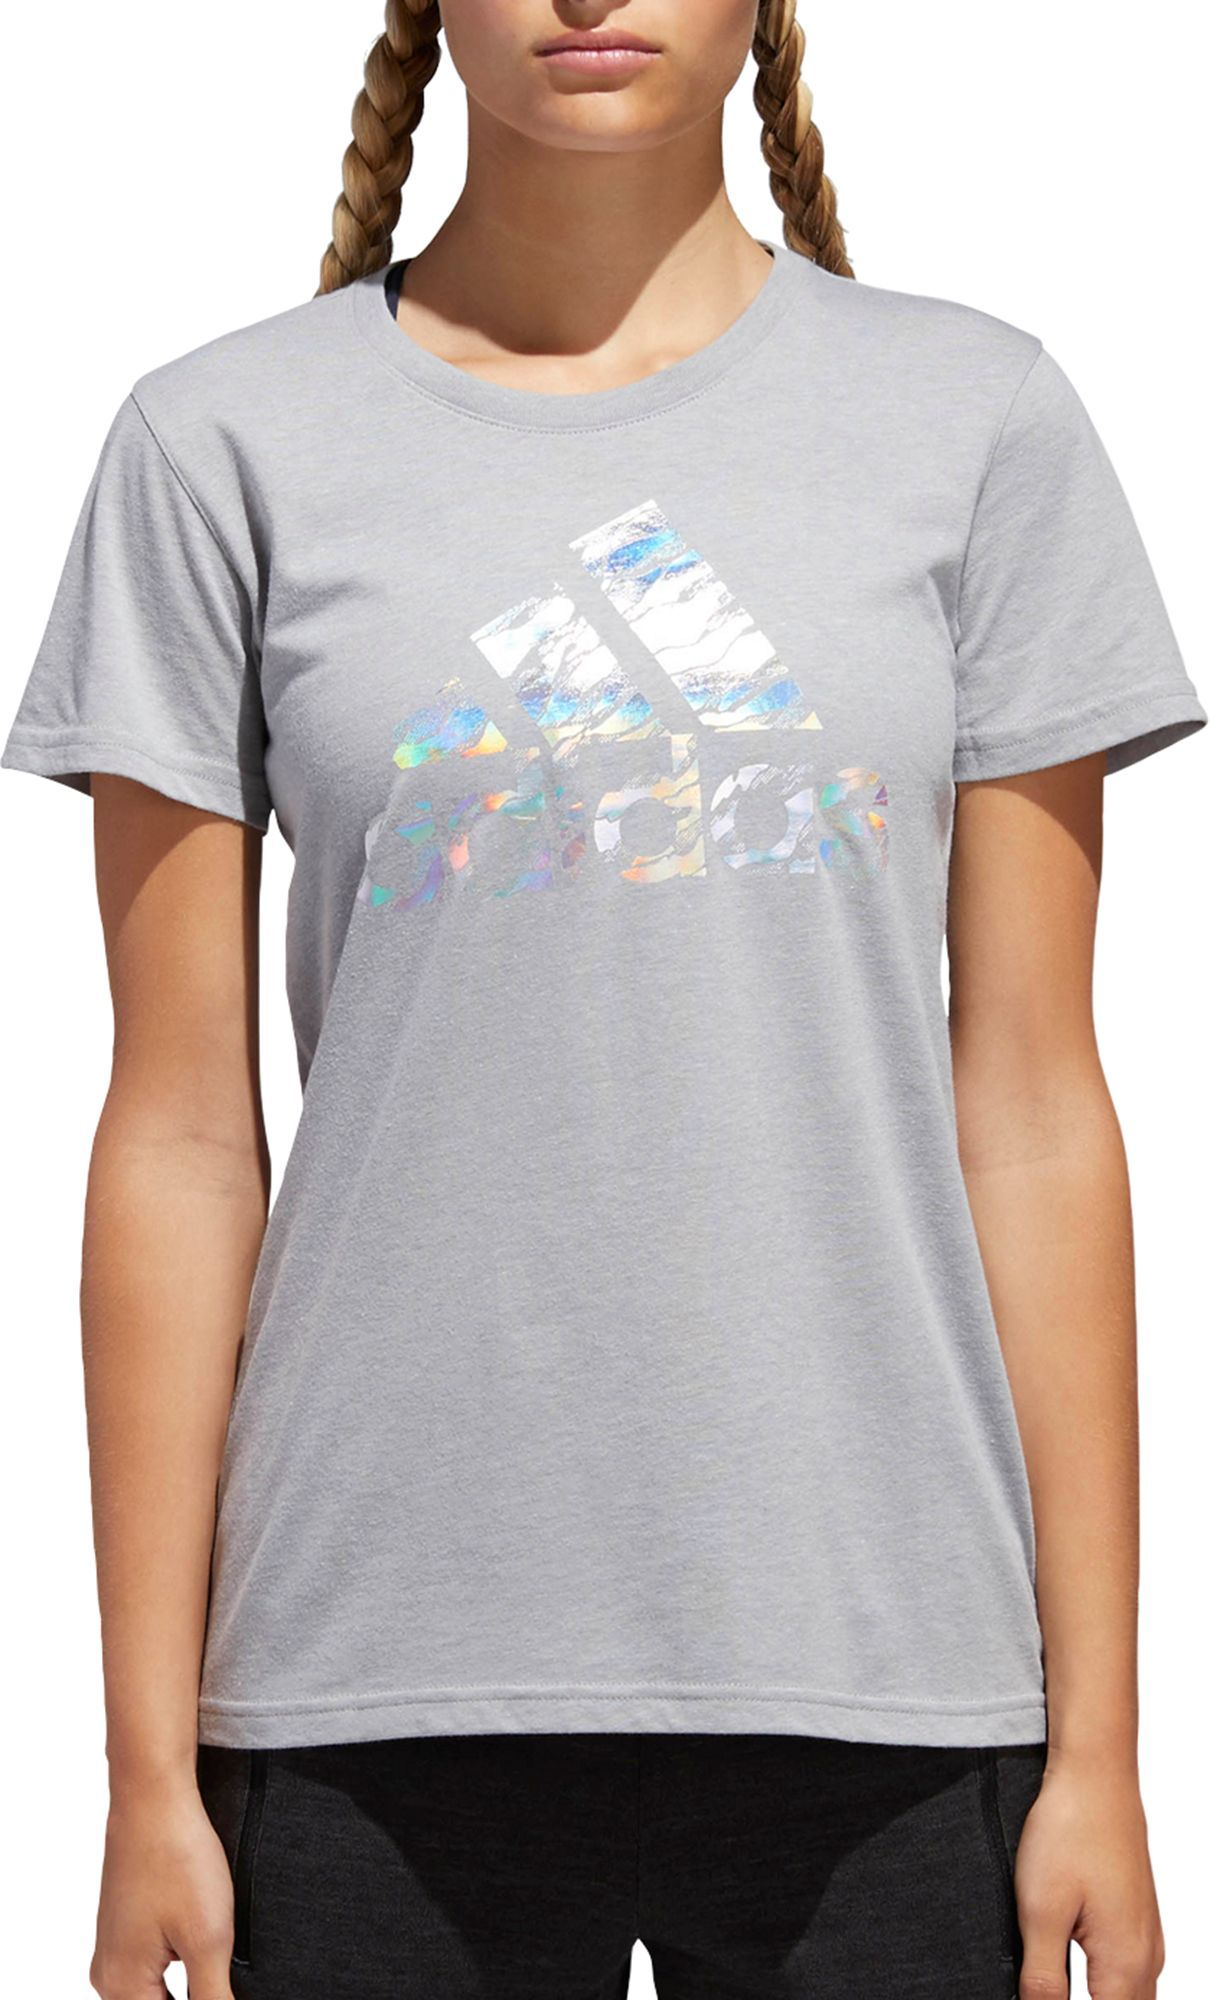 ec7cdbaeeaa0 adidas Women's Camo Badge Of Sport Logo Graphic T-Shirt, Size: Medium, Gray